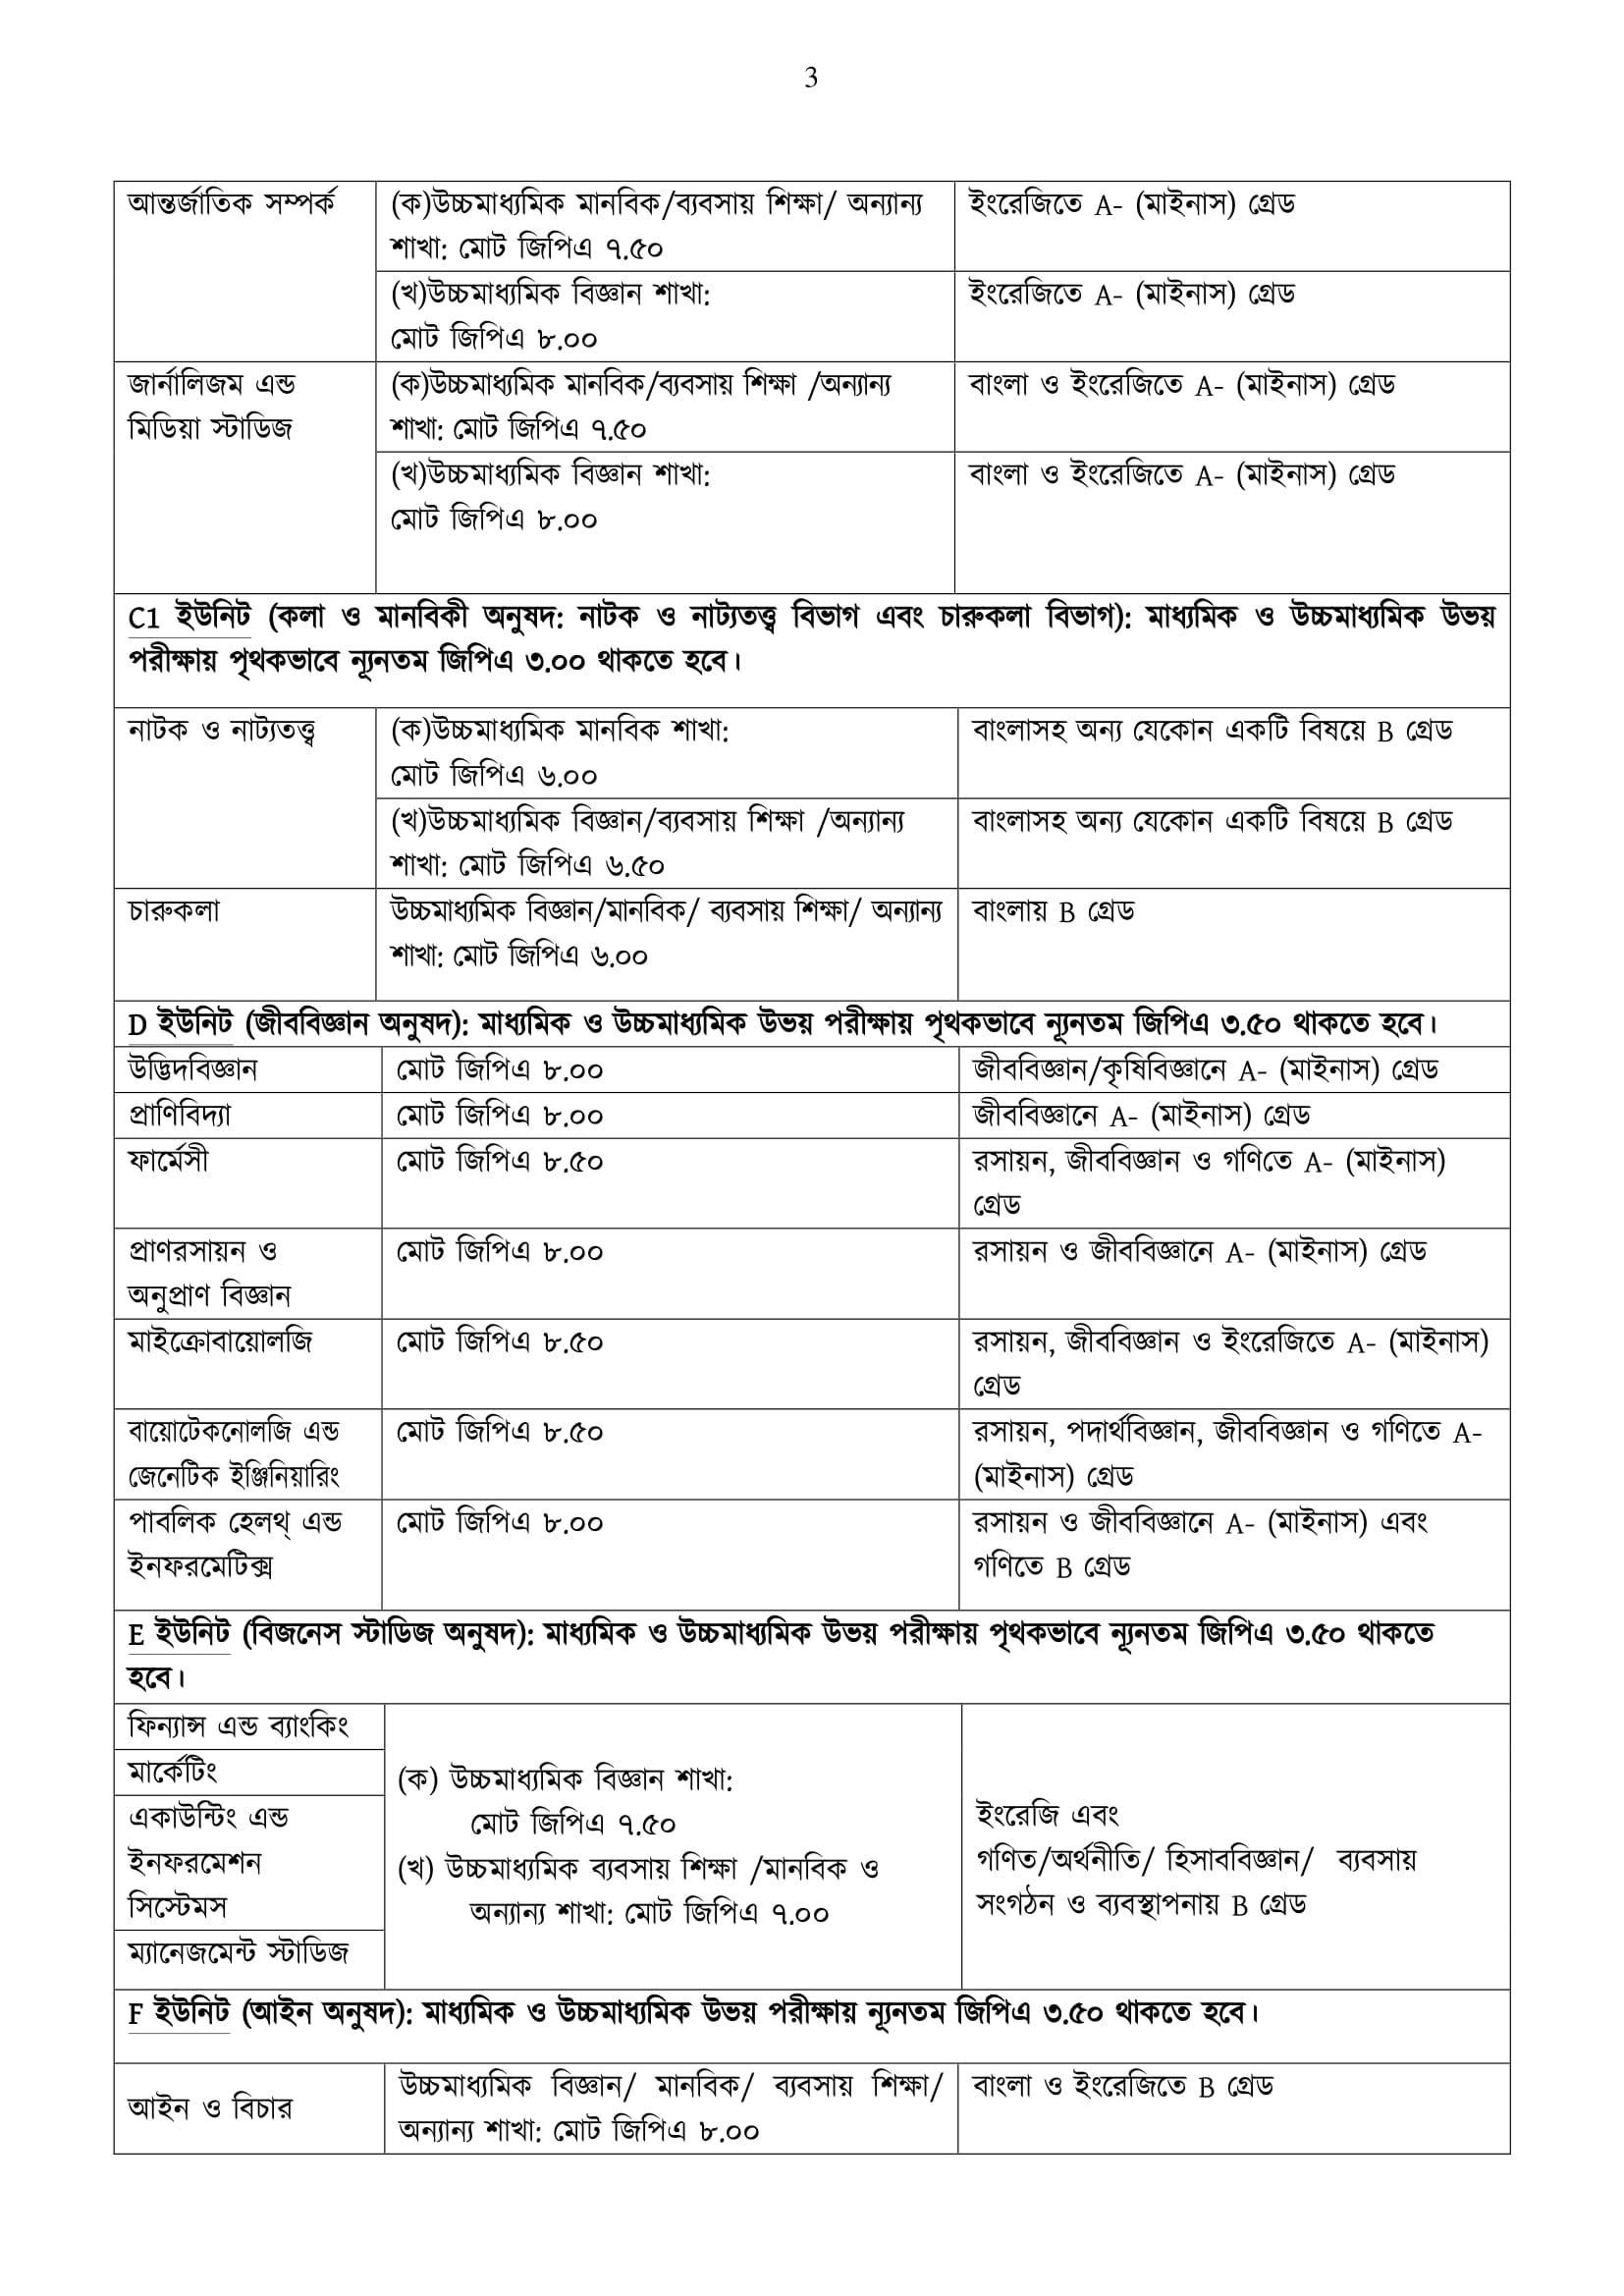 Jahangirnagar University Admission Circular 2019-20 3